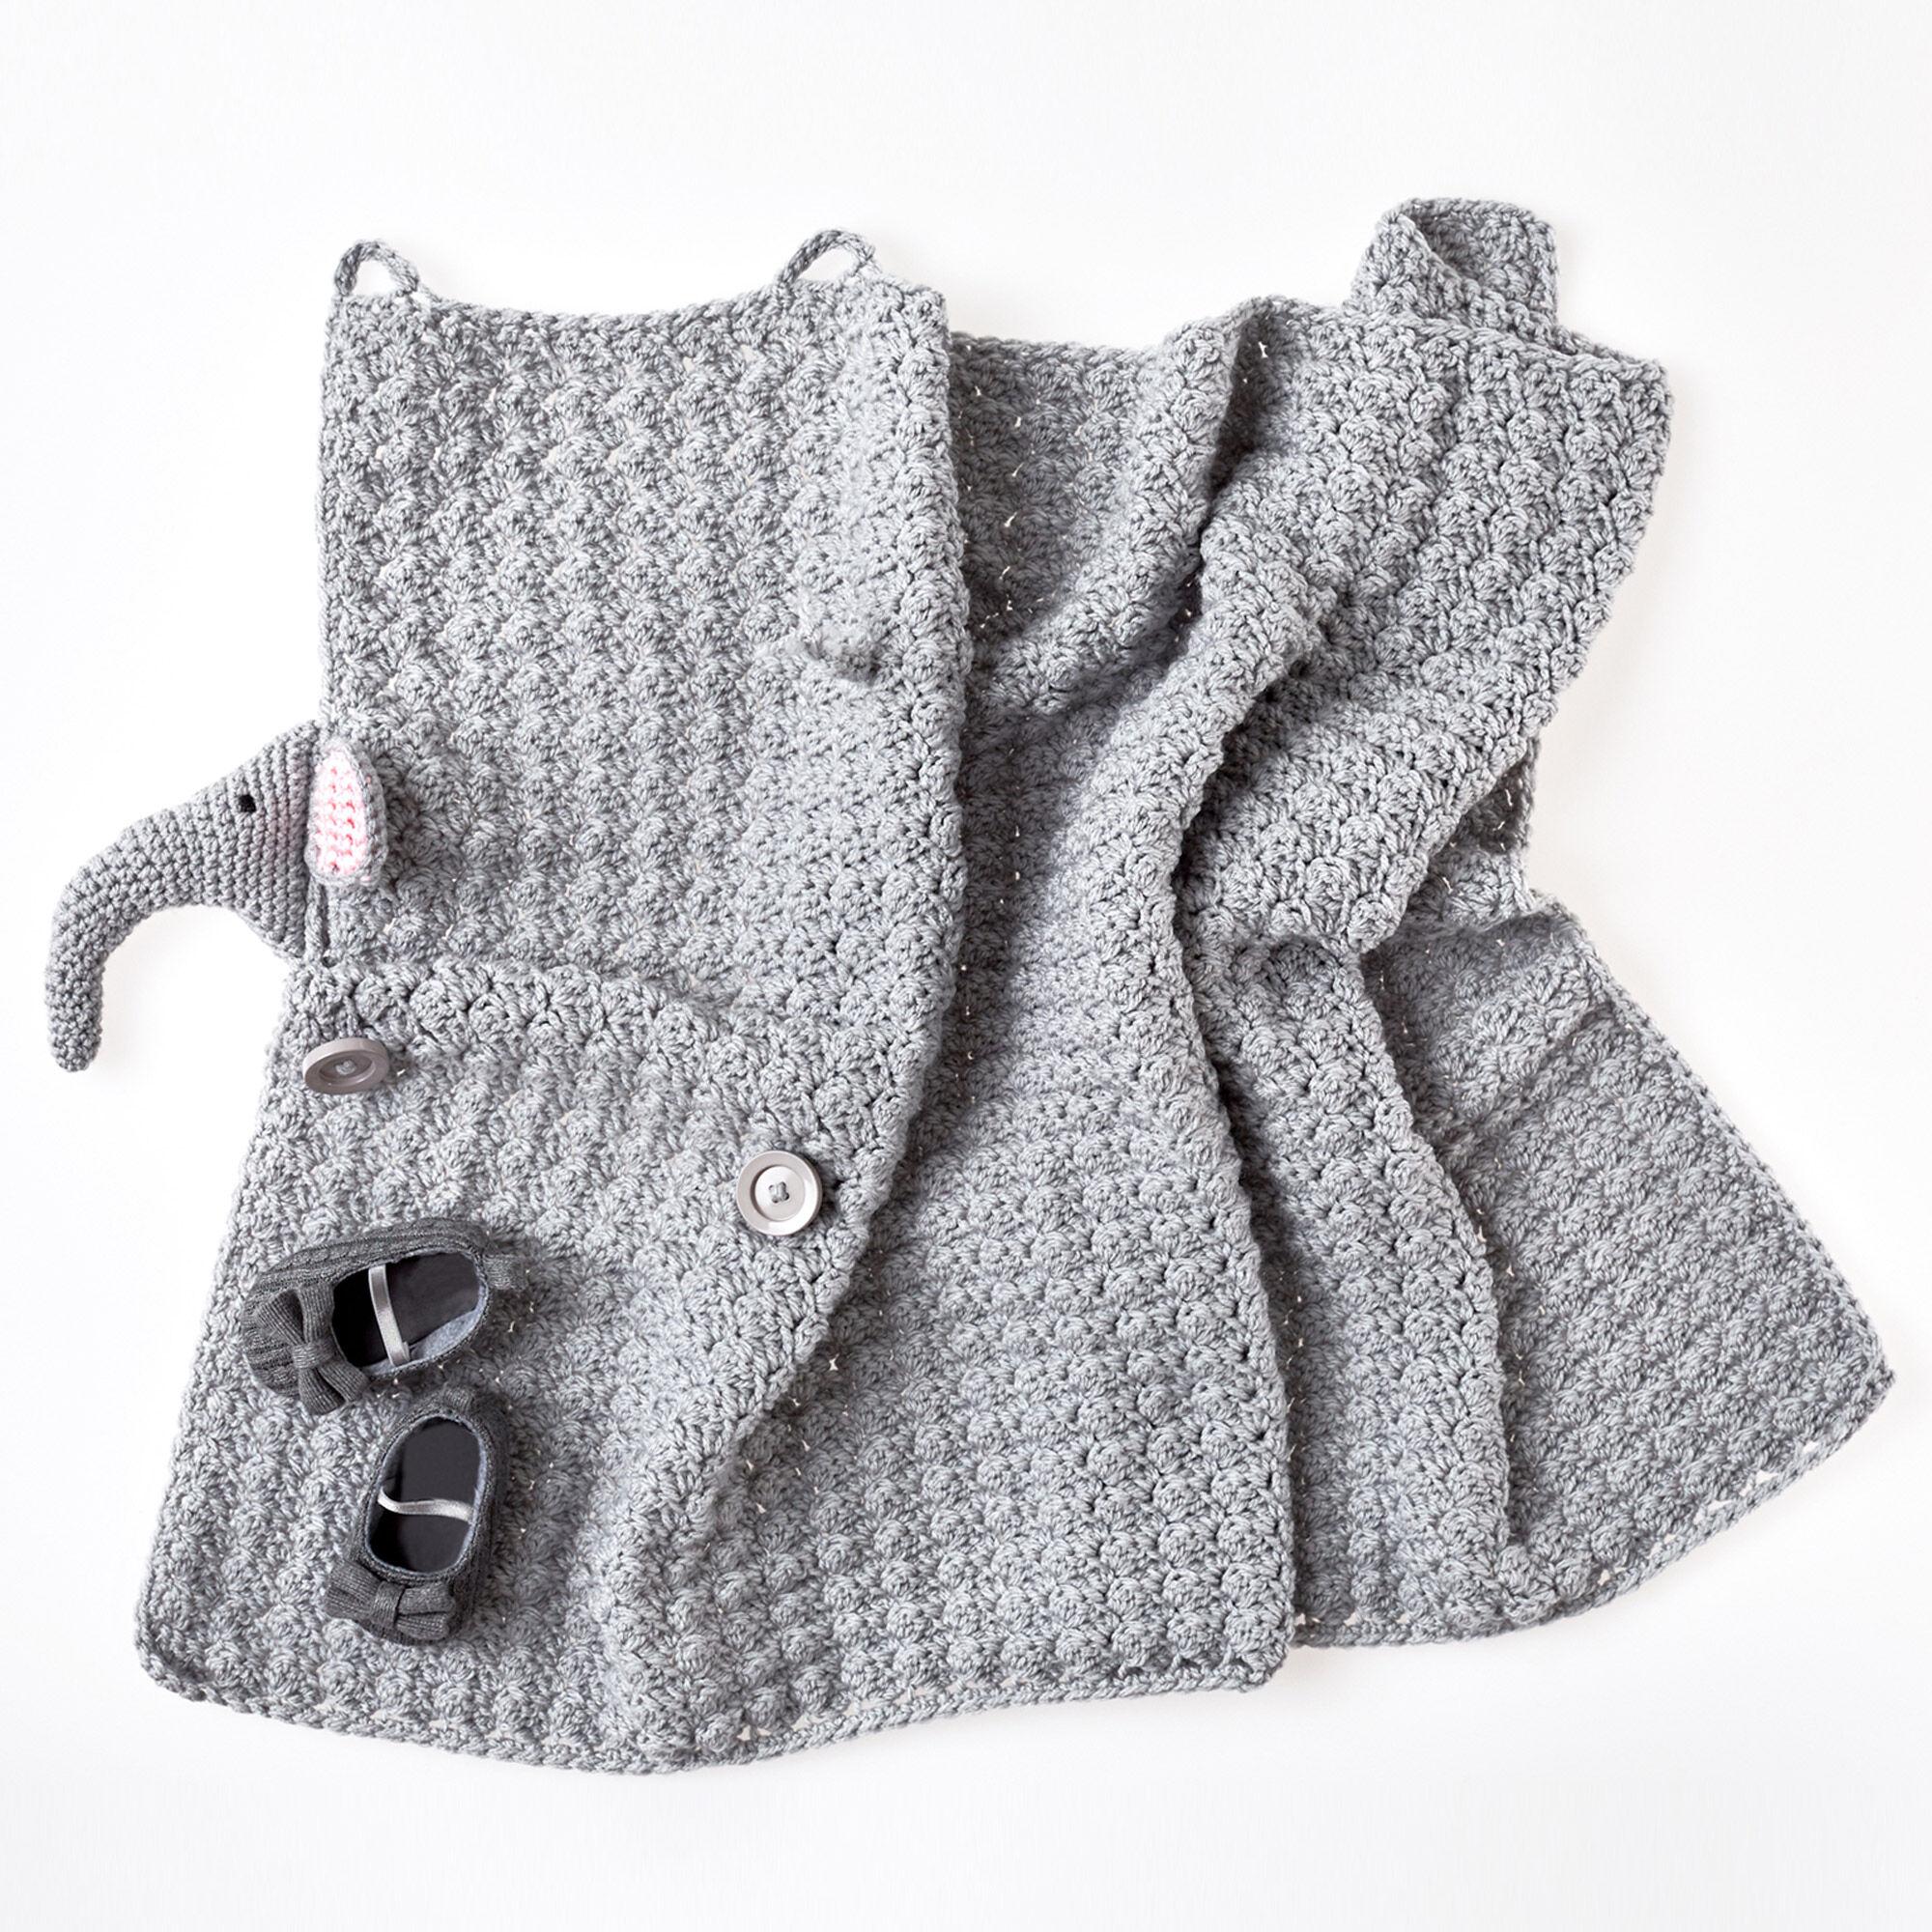 Adorable Elephant (Free Crochet Pattern) – One Zero Crochet | 2000x2000